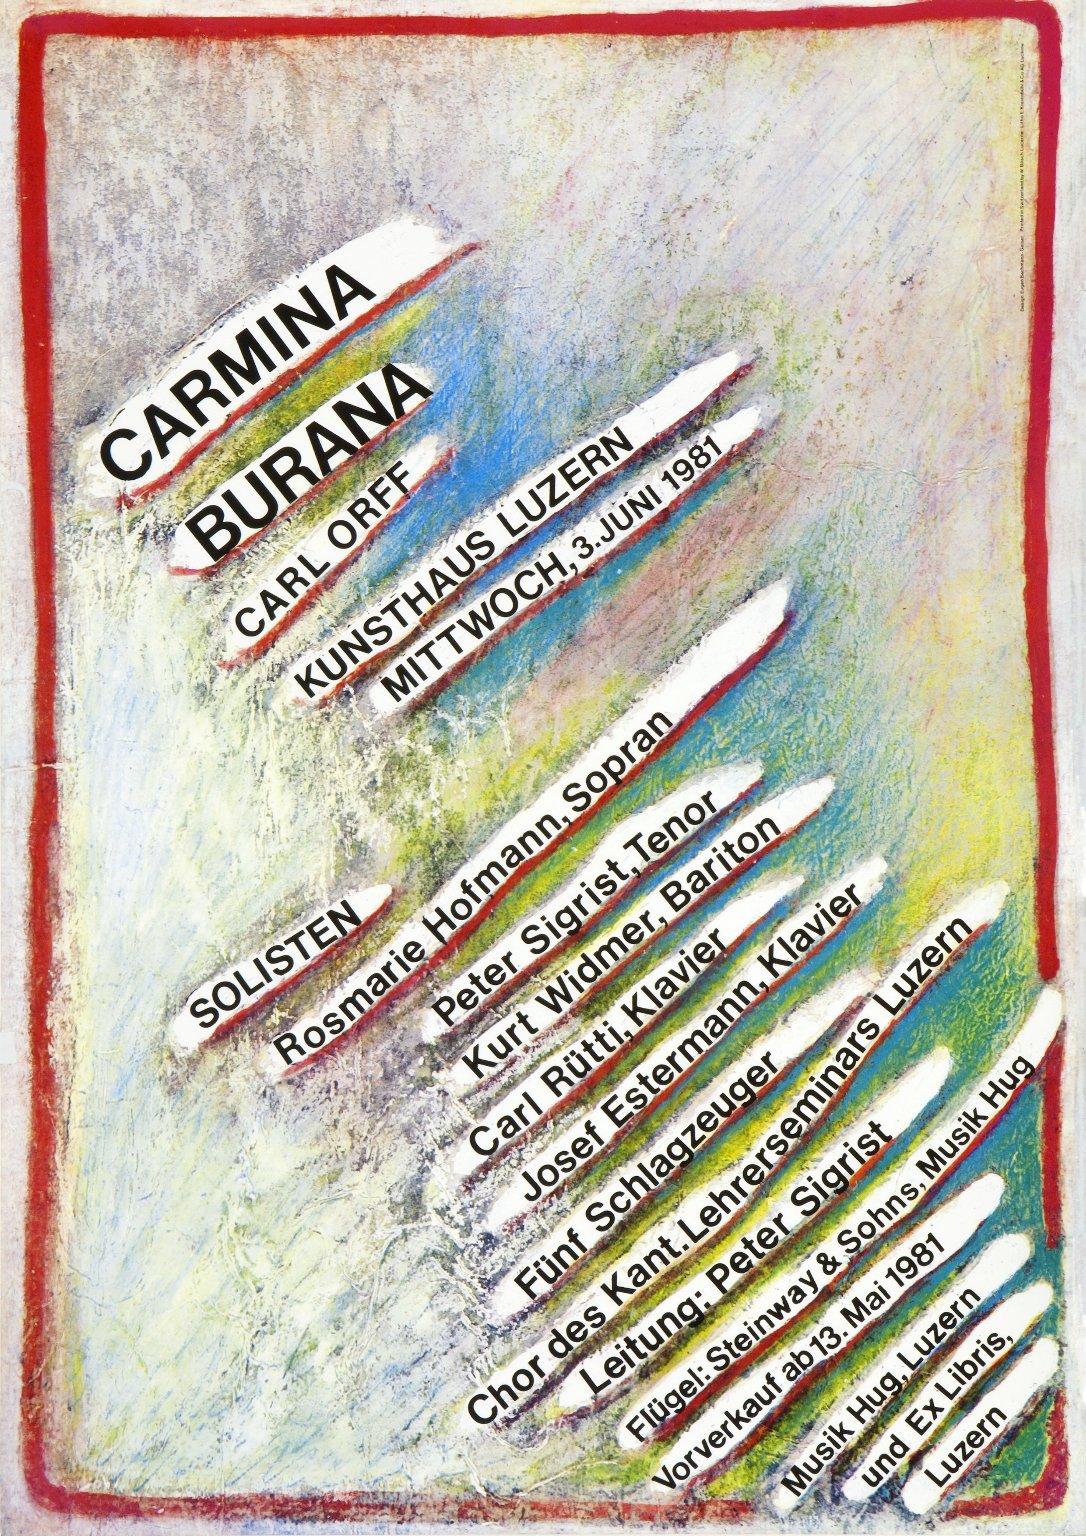 Konzert: Carmina Burana